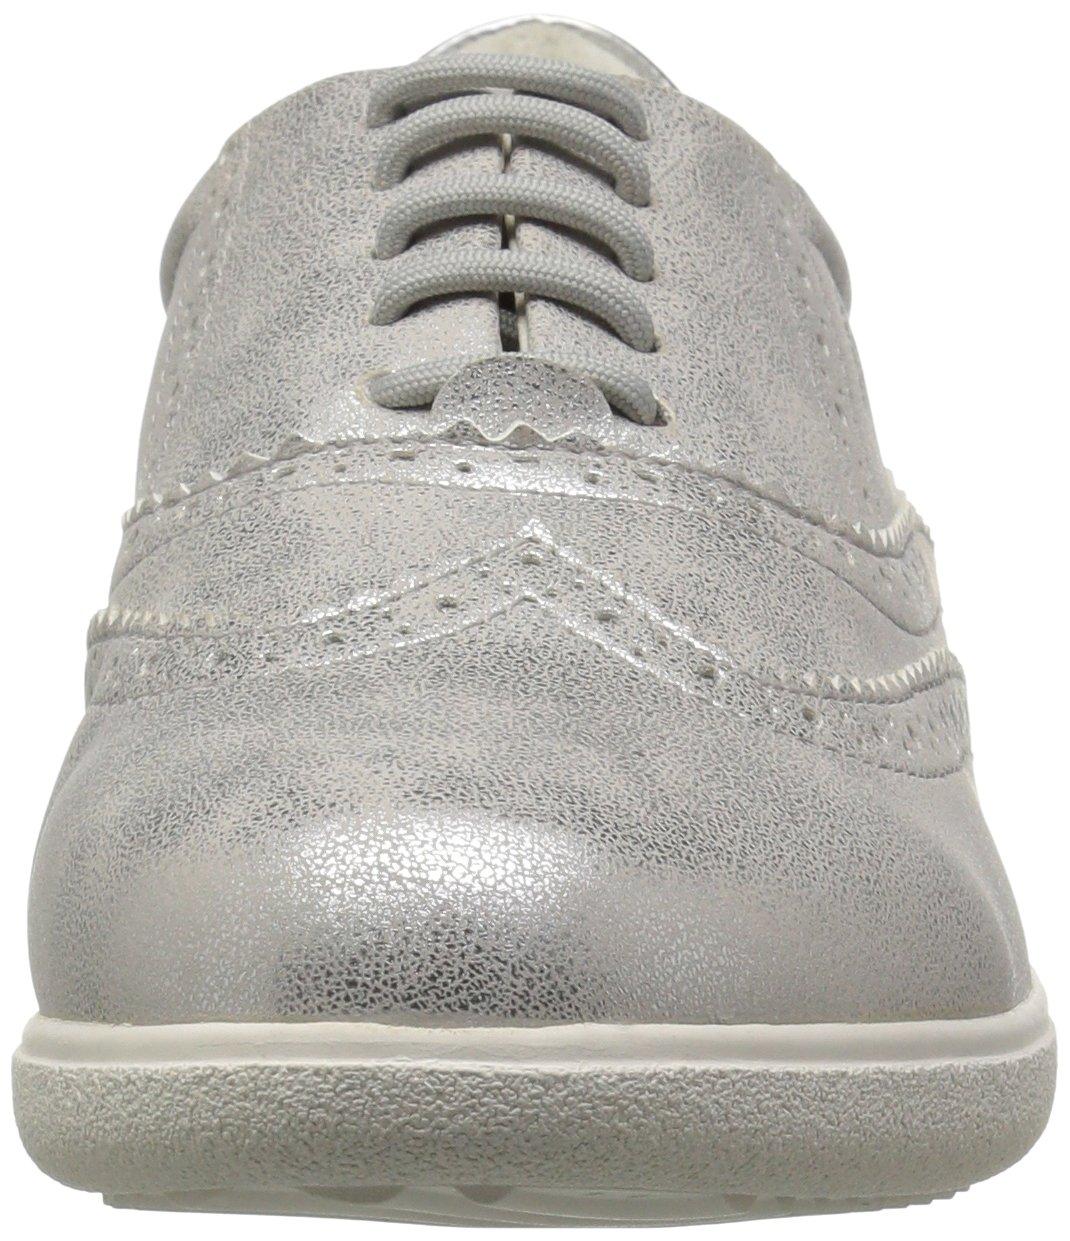 Geox Women's Nihal 1 Sneaker B073HVBVCK 41 M EU (10.5 US)|Off White/Silver